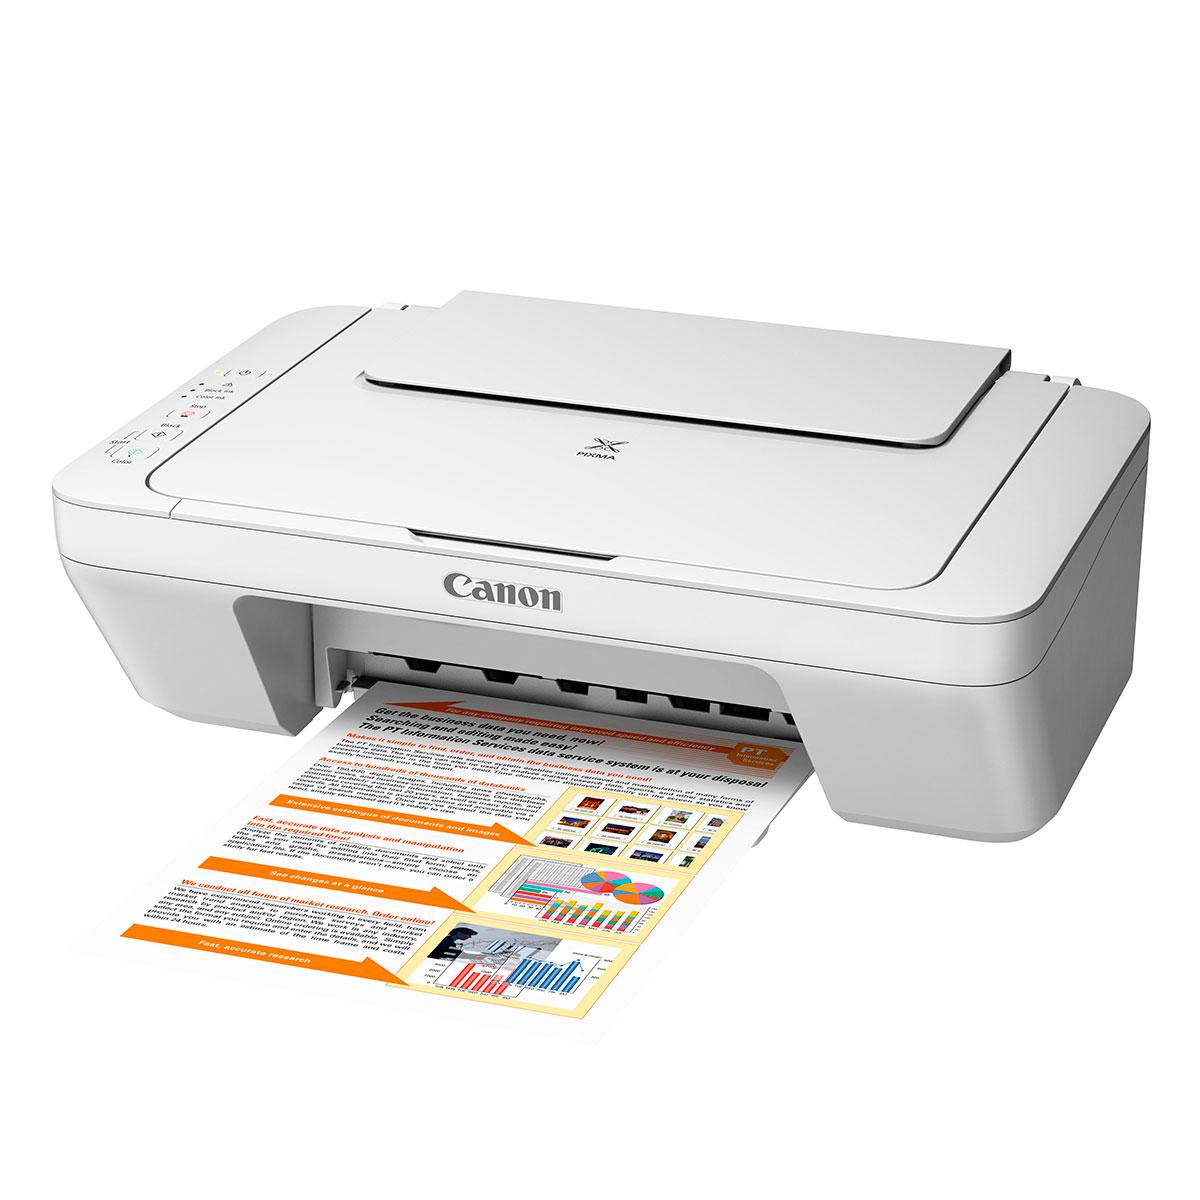 canon pixma mg2550 imprimante multifonction canon sur. Black Bedroom Furniture Sets. Home Design Ideas